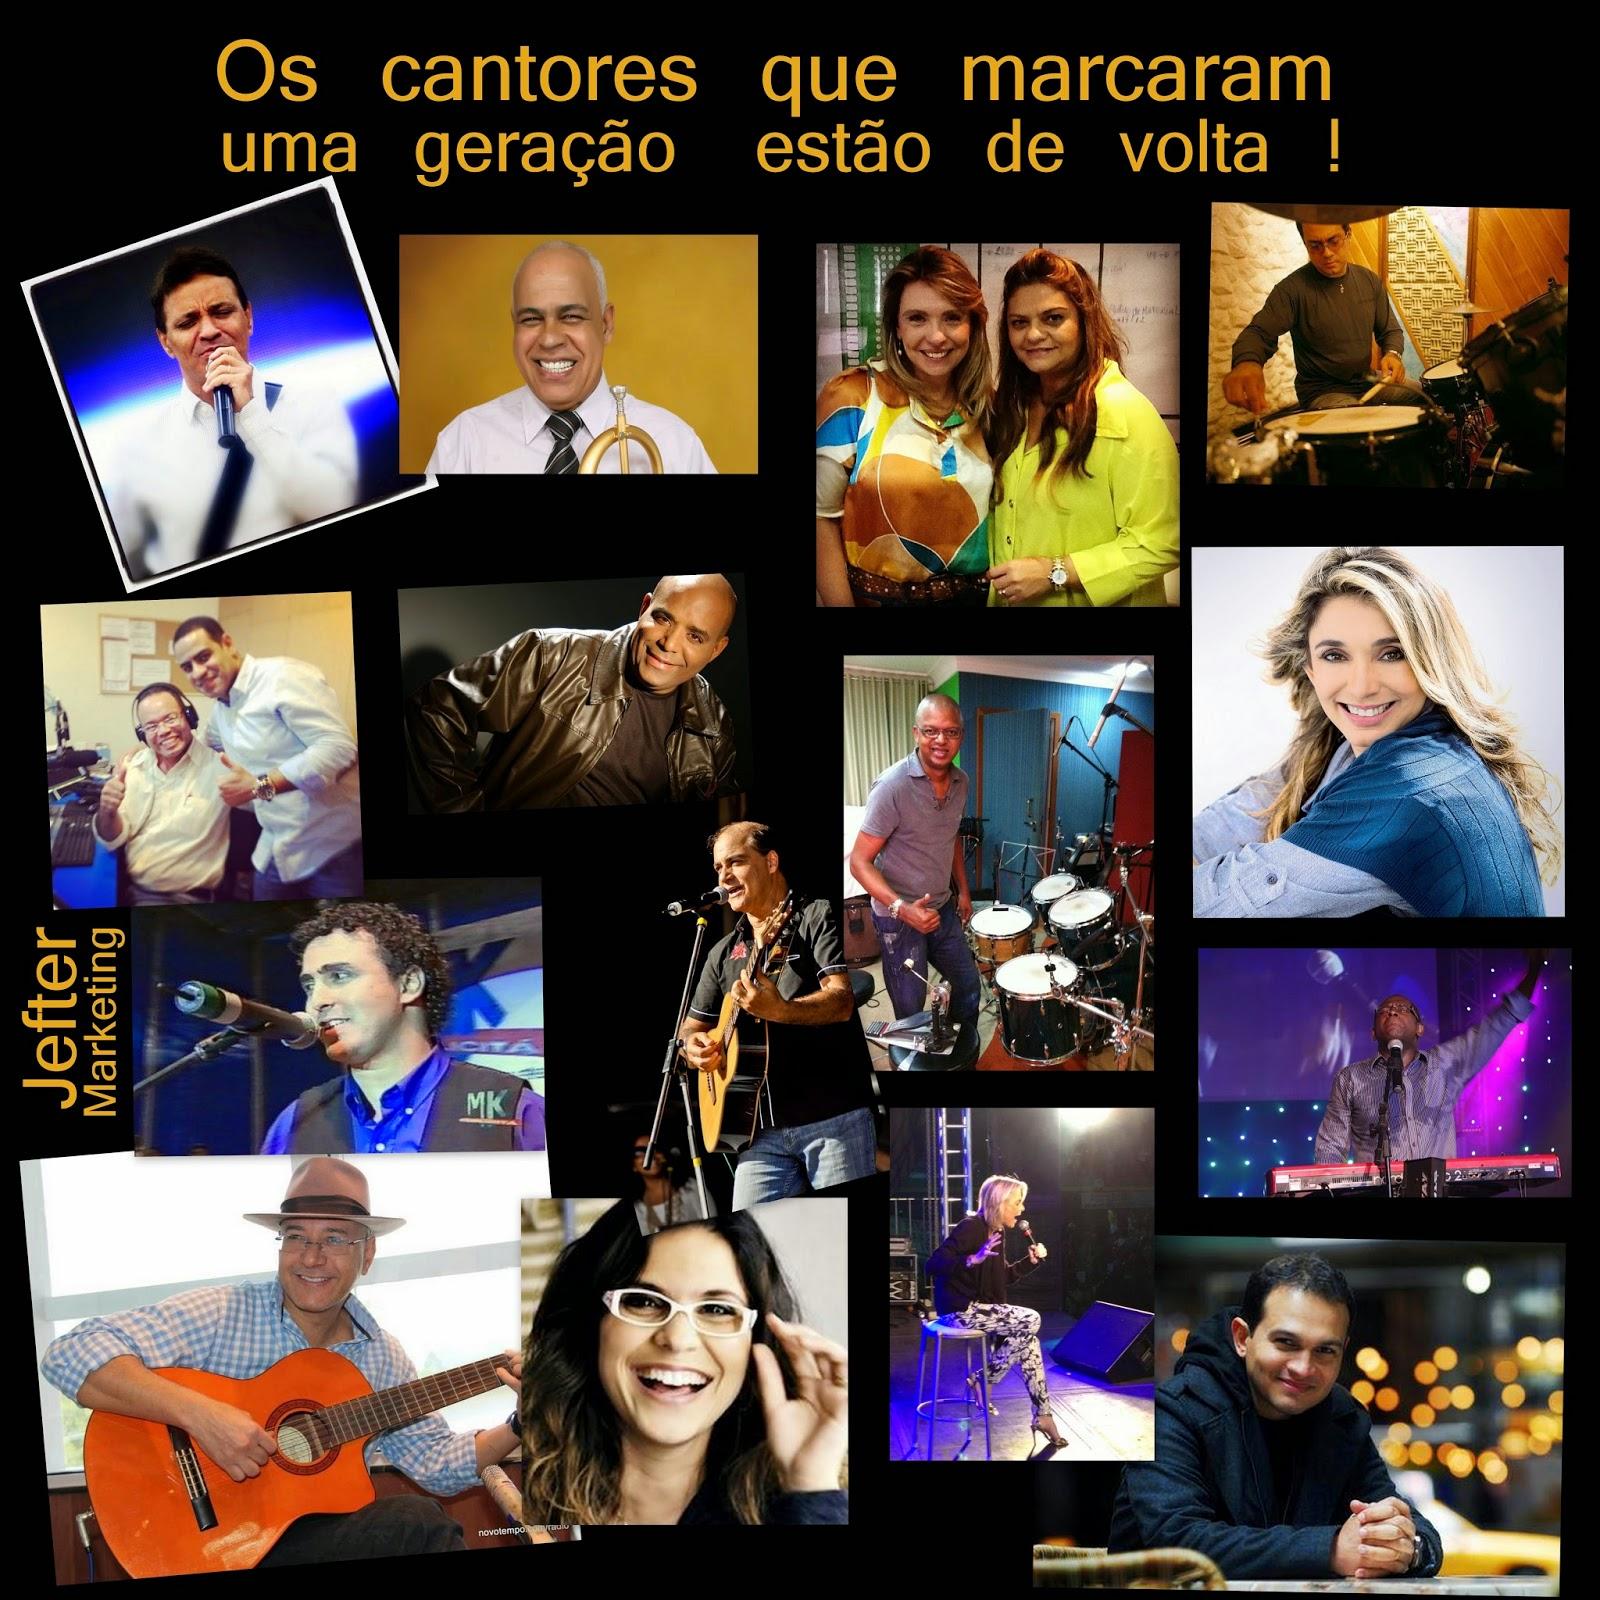 www.reviverrepresentacoes.com.br/loja